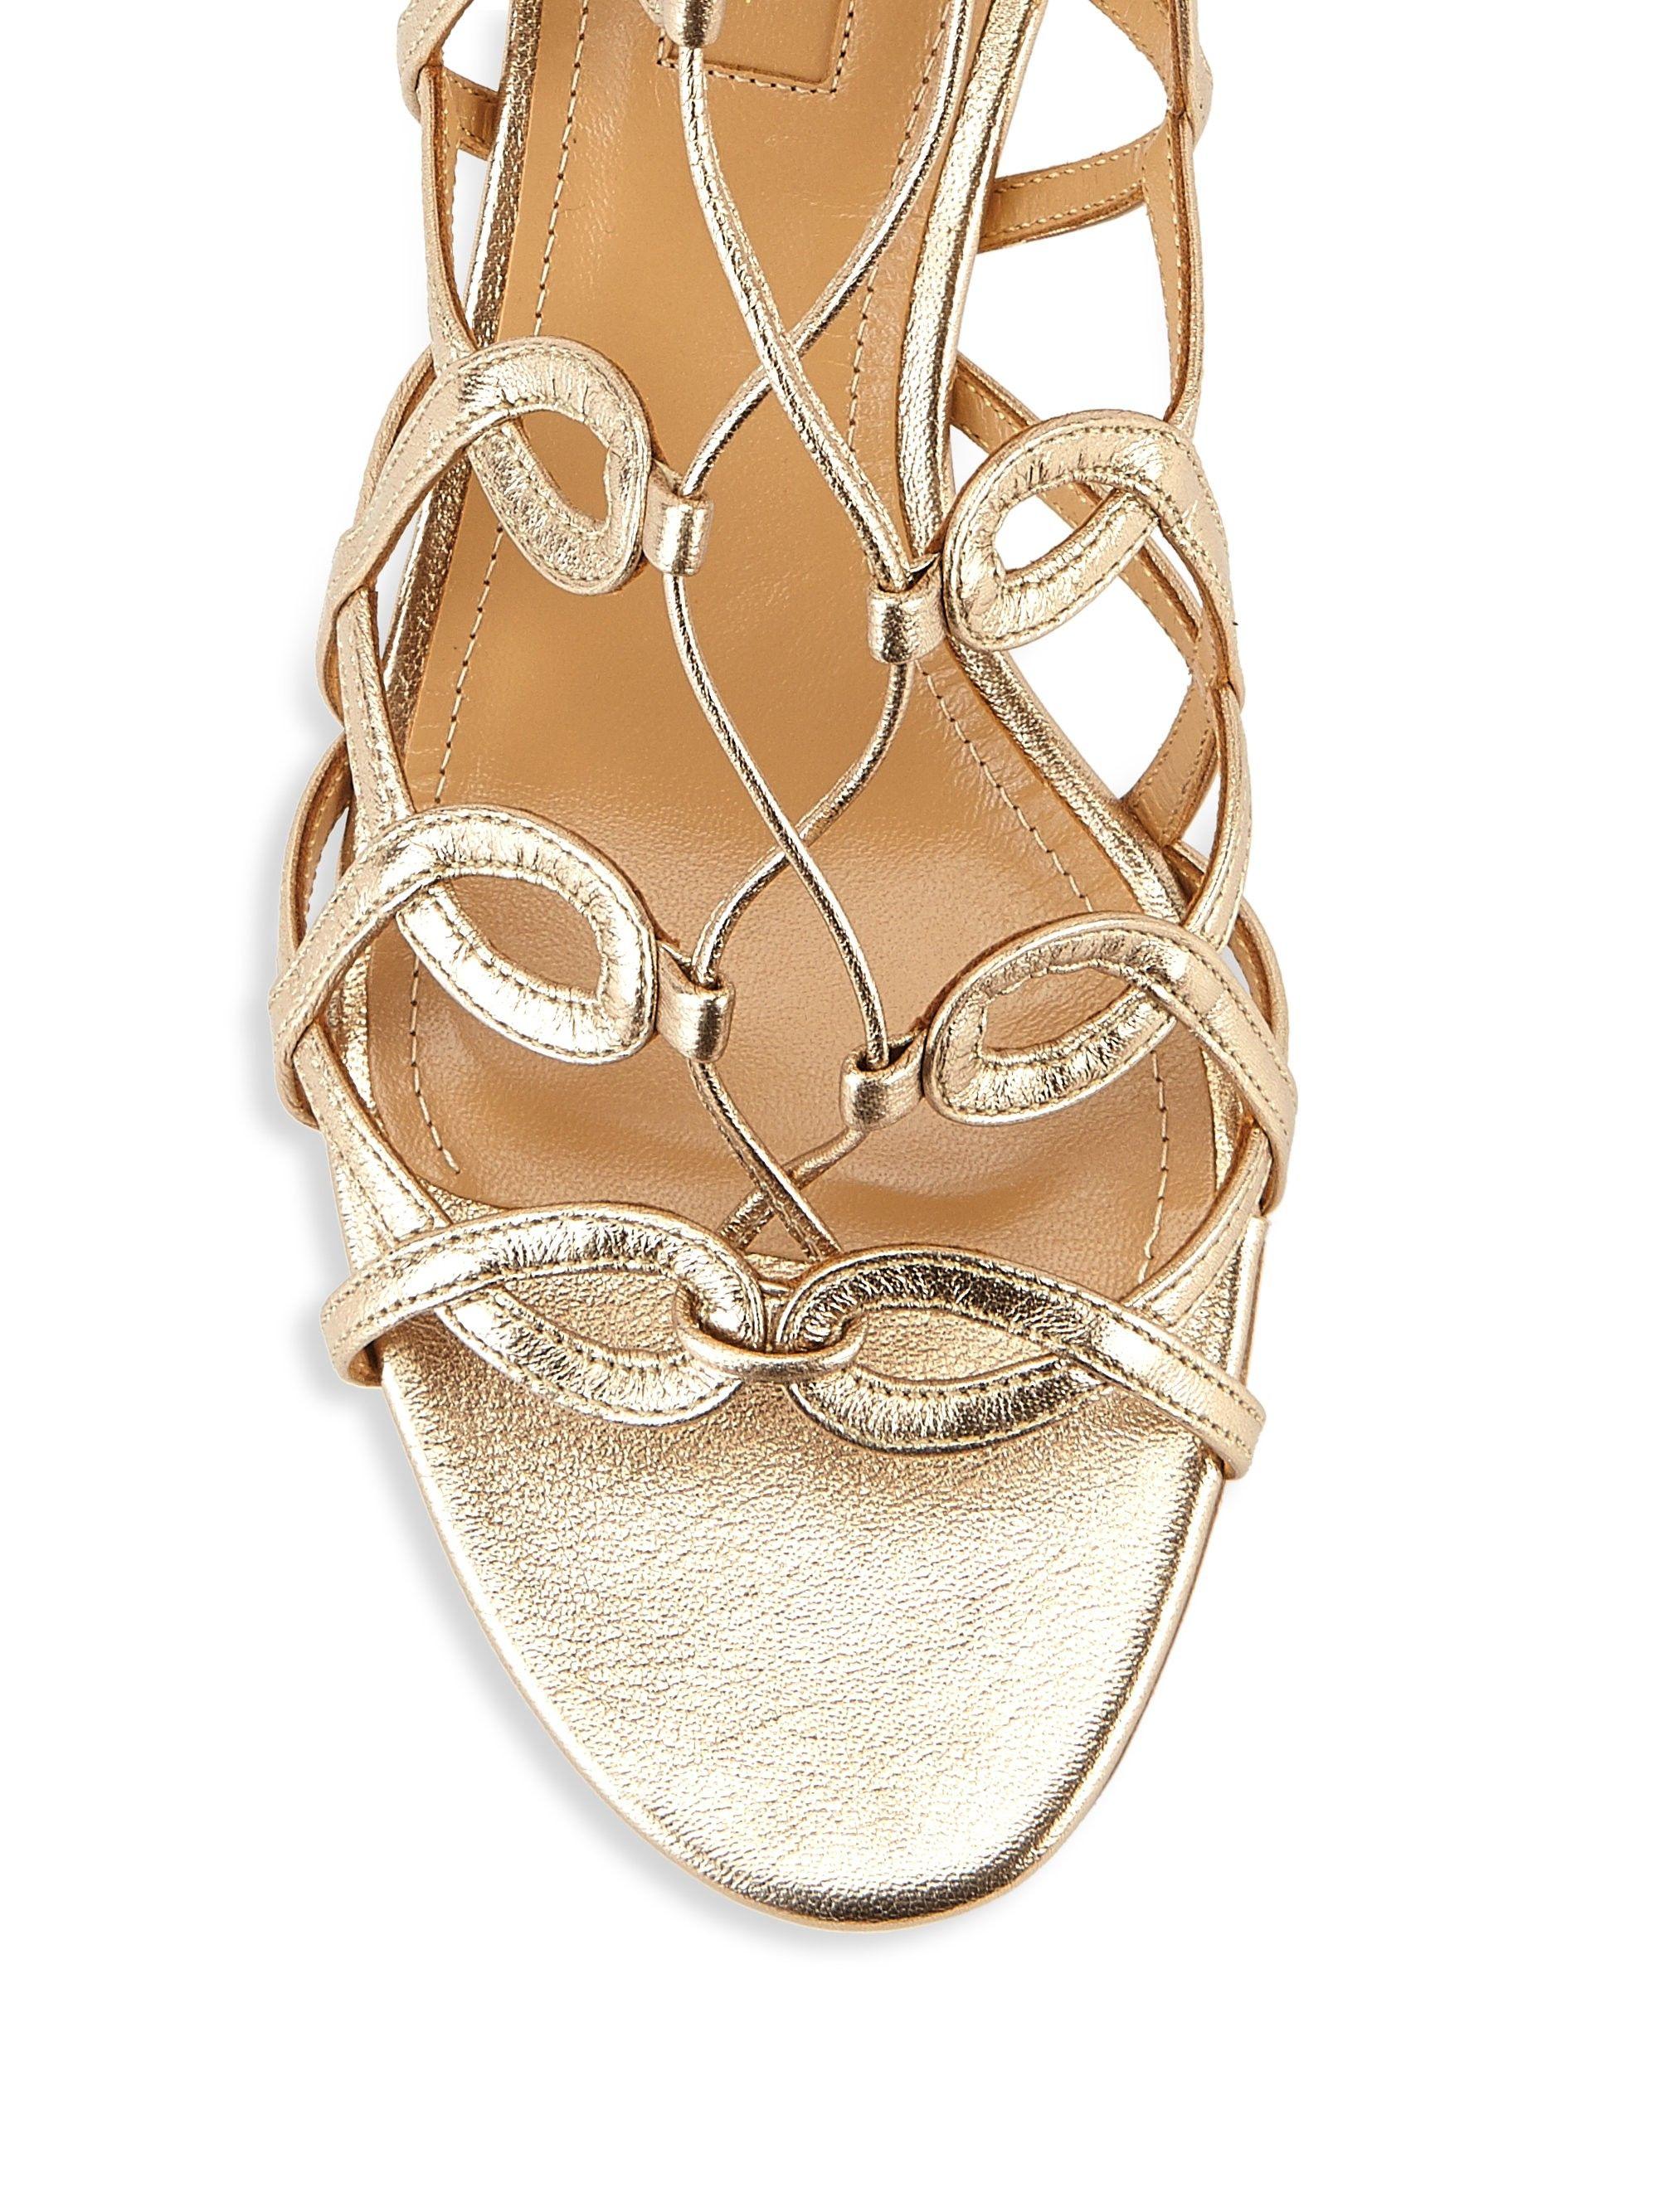 0f1840a44ed Aquazzura Mumbai Leather Gladiator Sandals - Light Copper 38.5 (8.5)